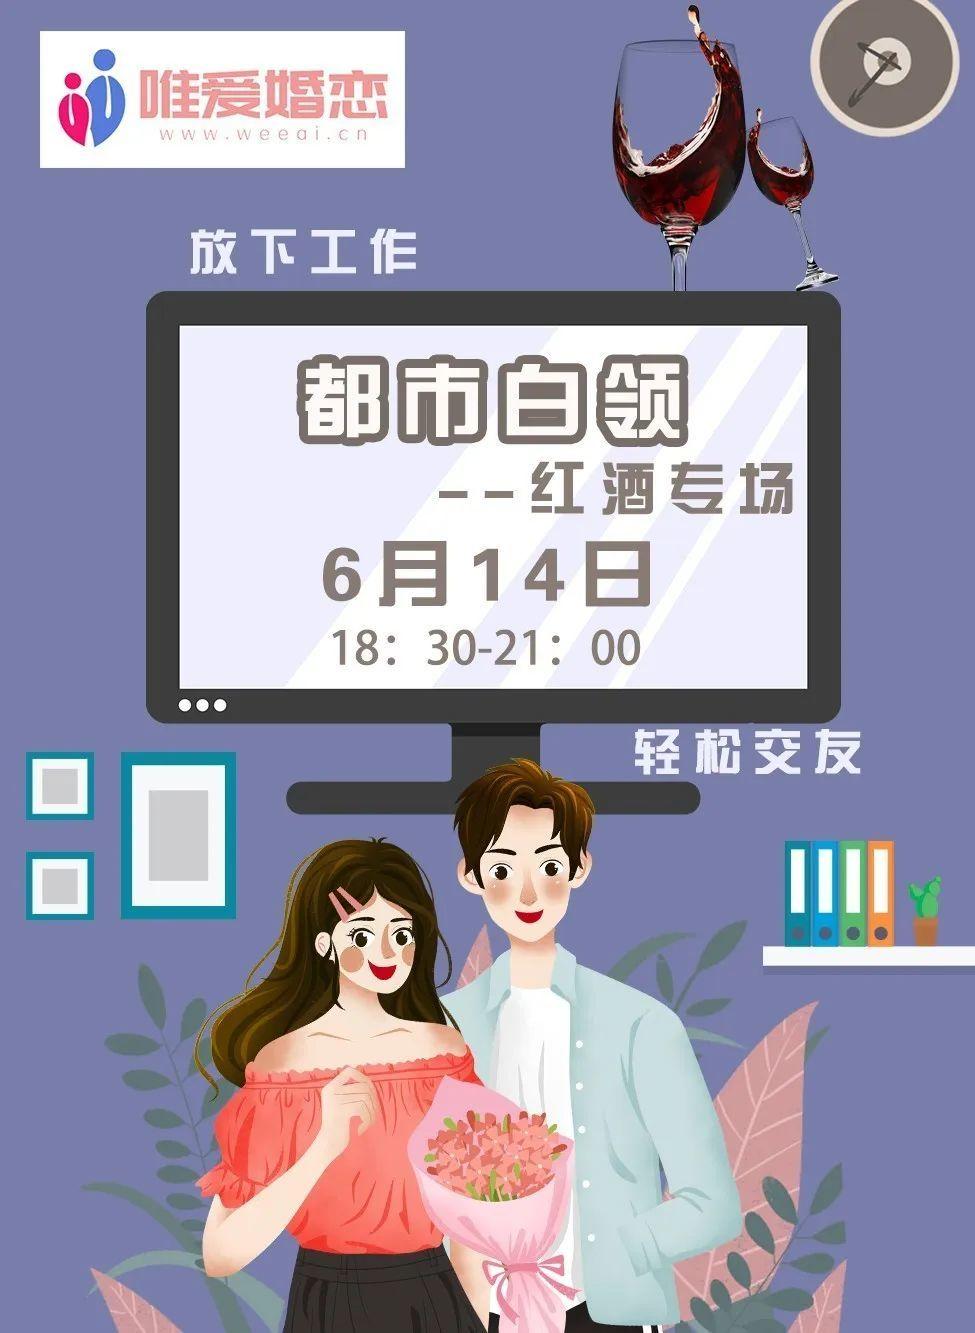 WeChat 圖片_20200524095534.jpg